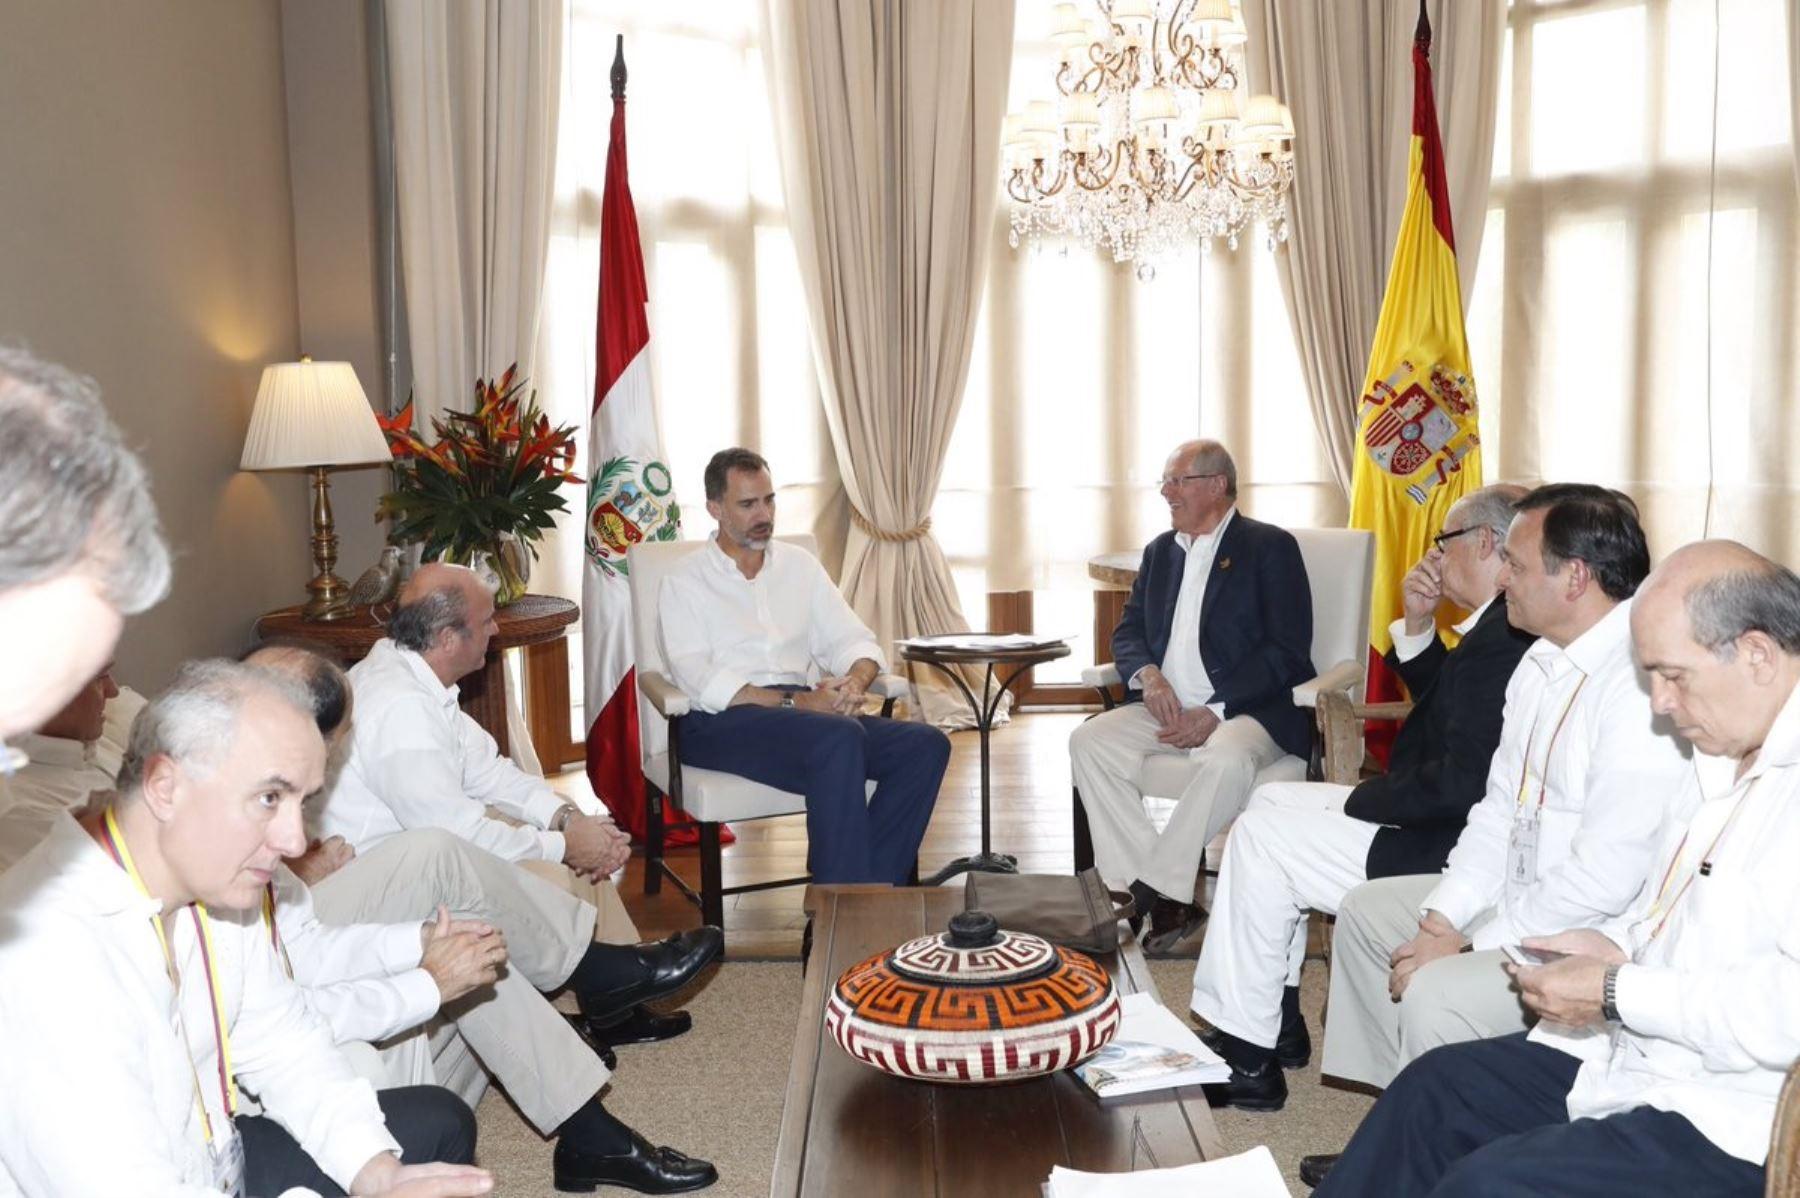 Presidente Pedro Pablo Kuczynski se reunió esta tarde con el rey de España. Foto: @CasaReal